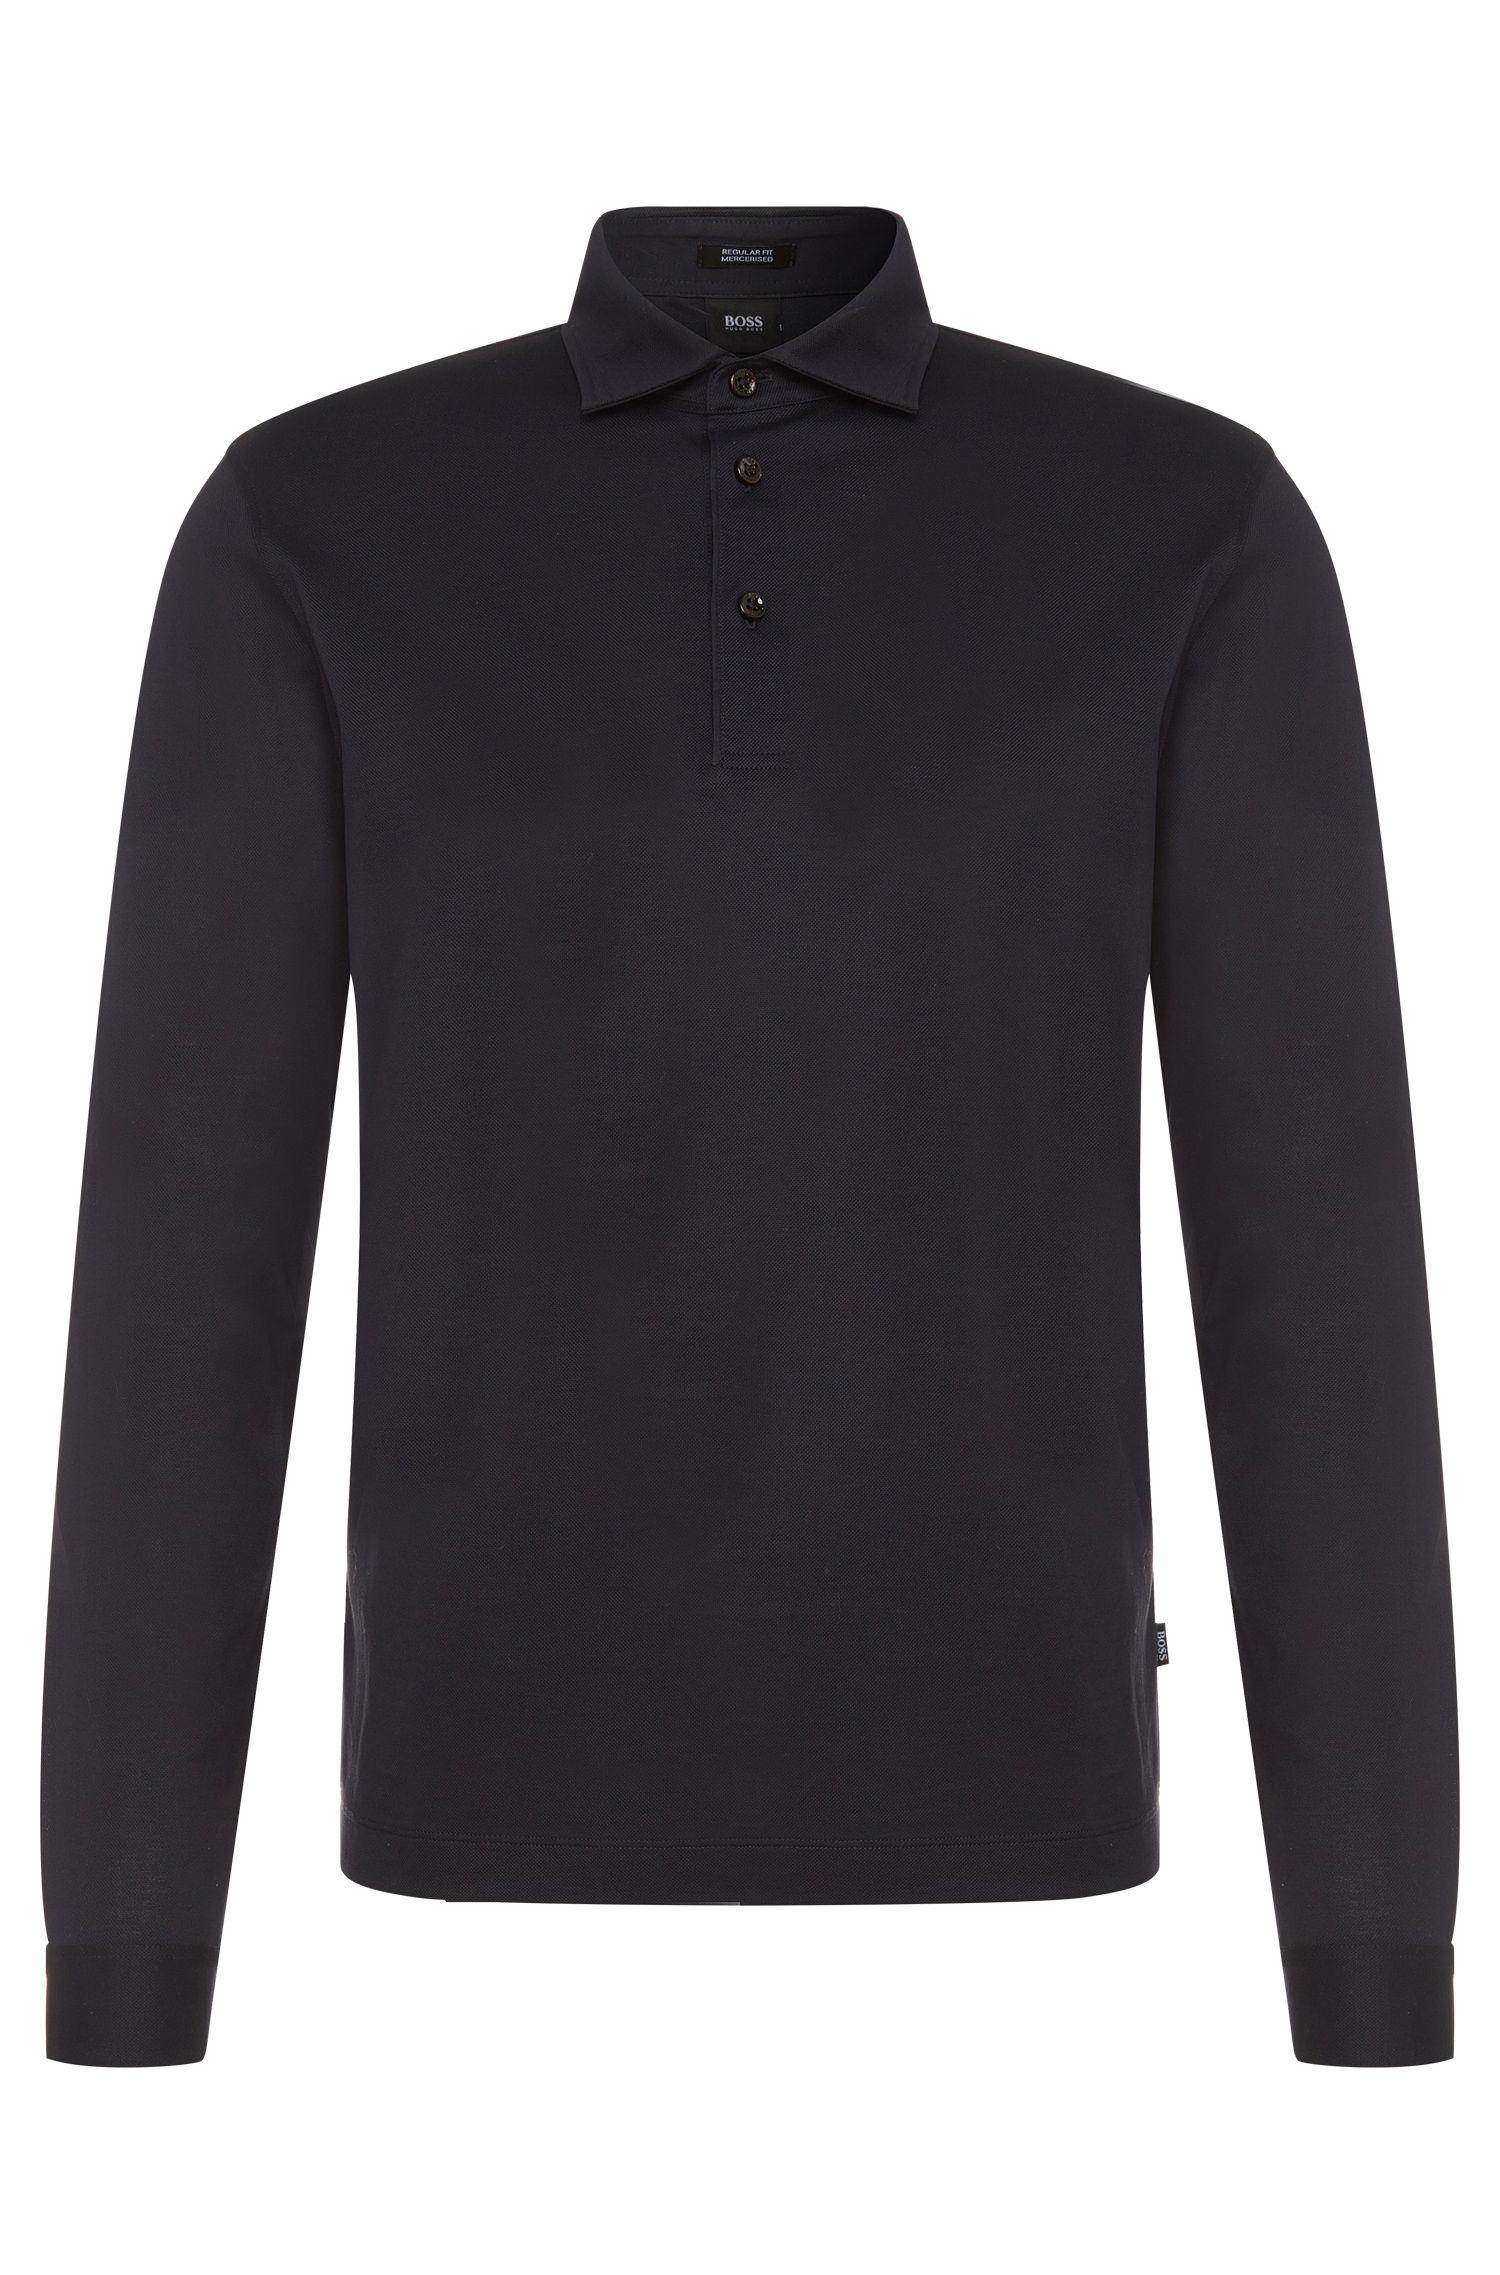 Regular-Fit Longsleeve-Poloshirt aus merzerisierter Baumwolle: 'Pickell 05'